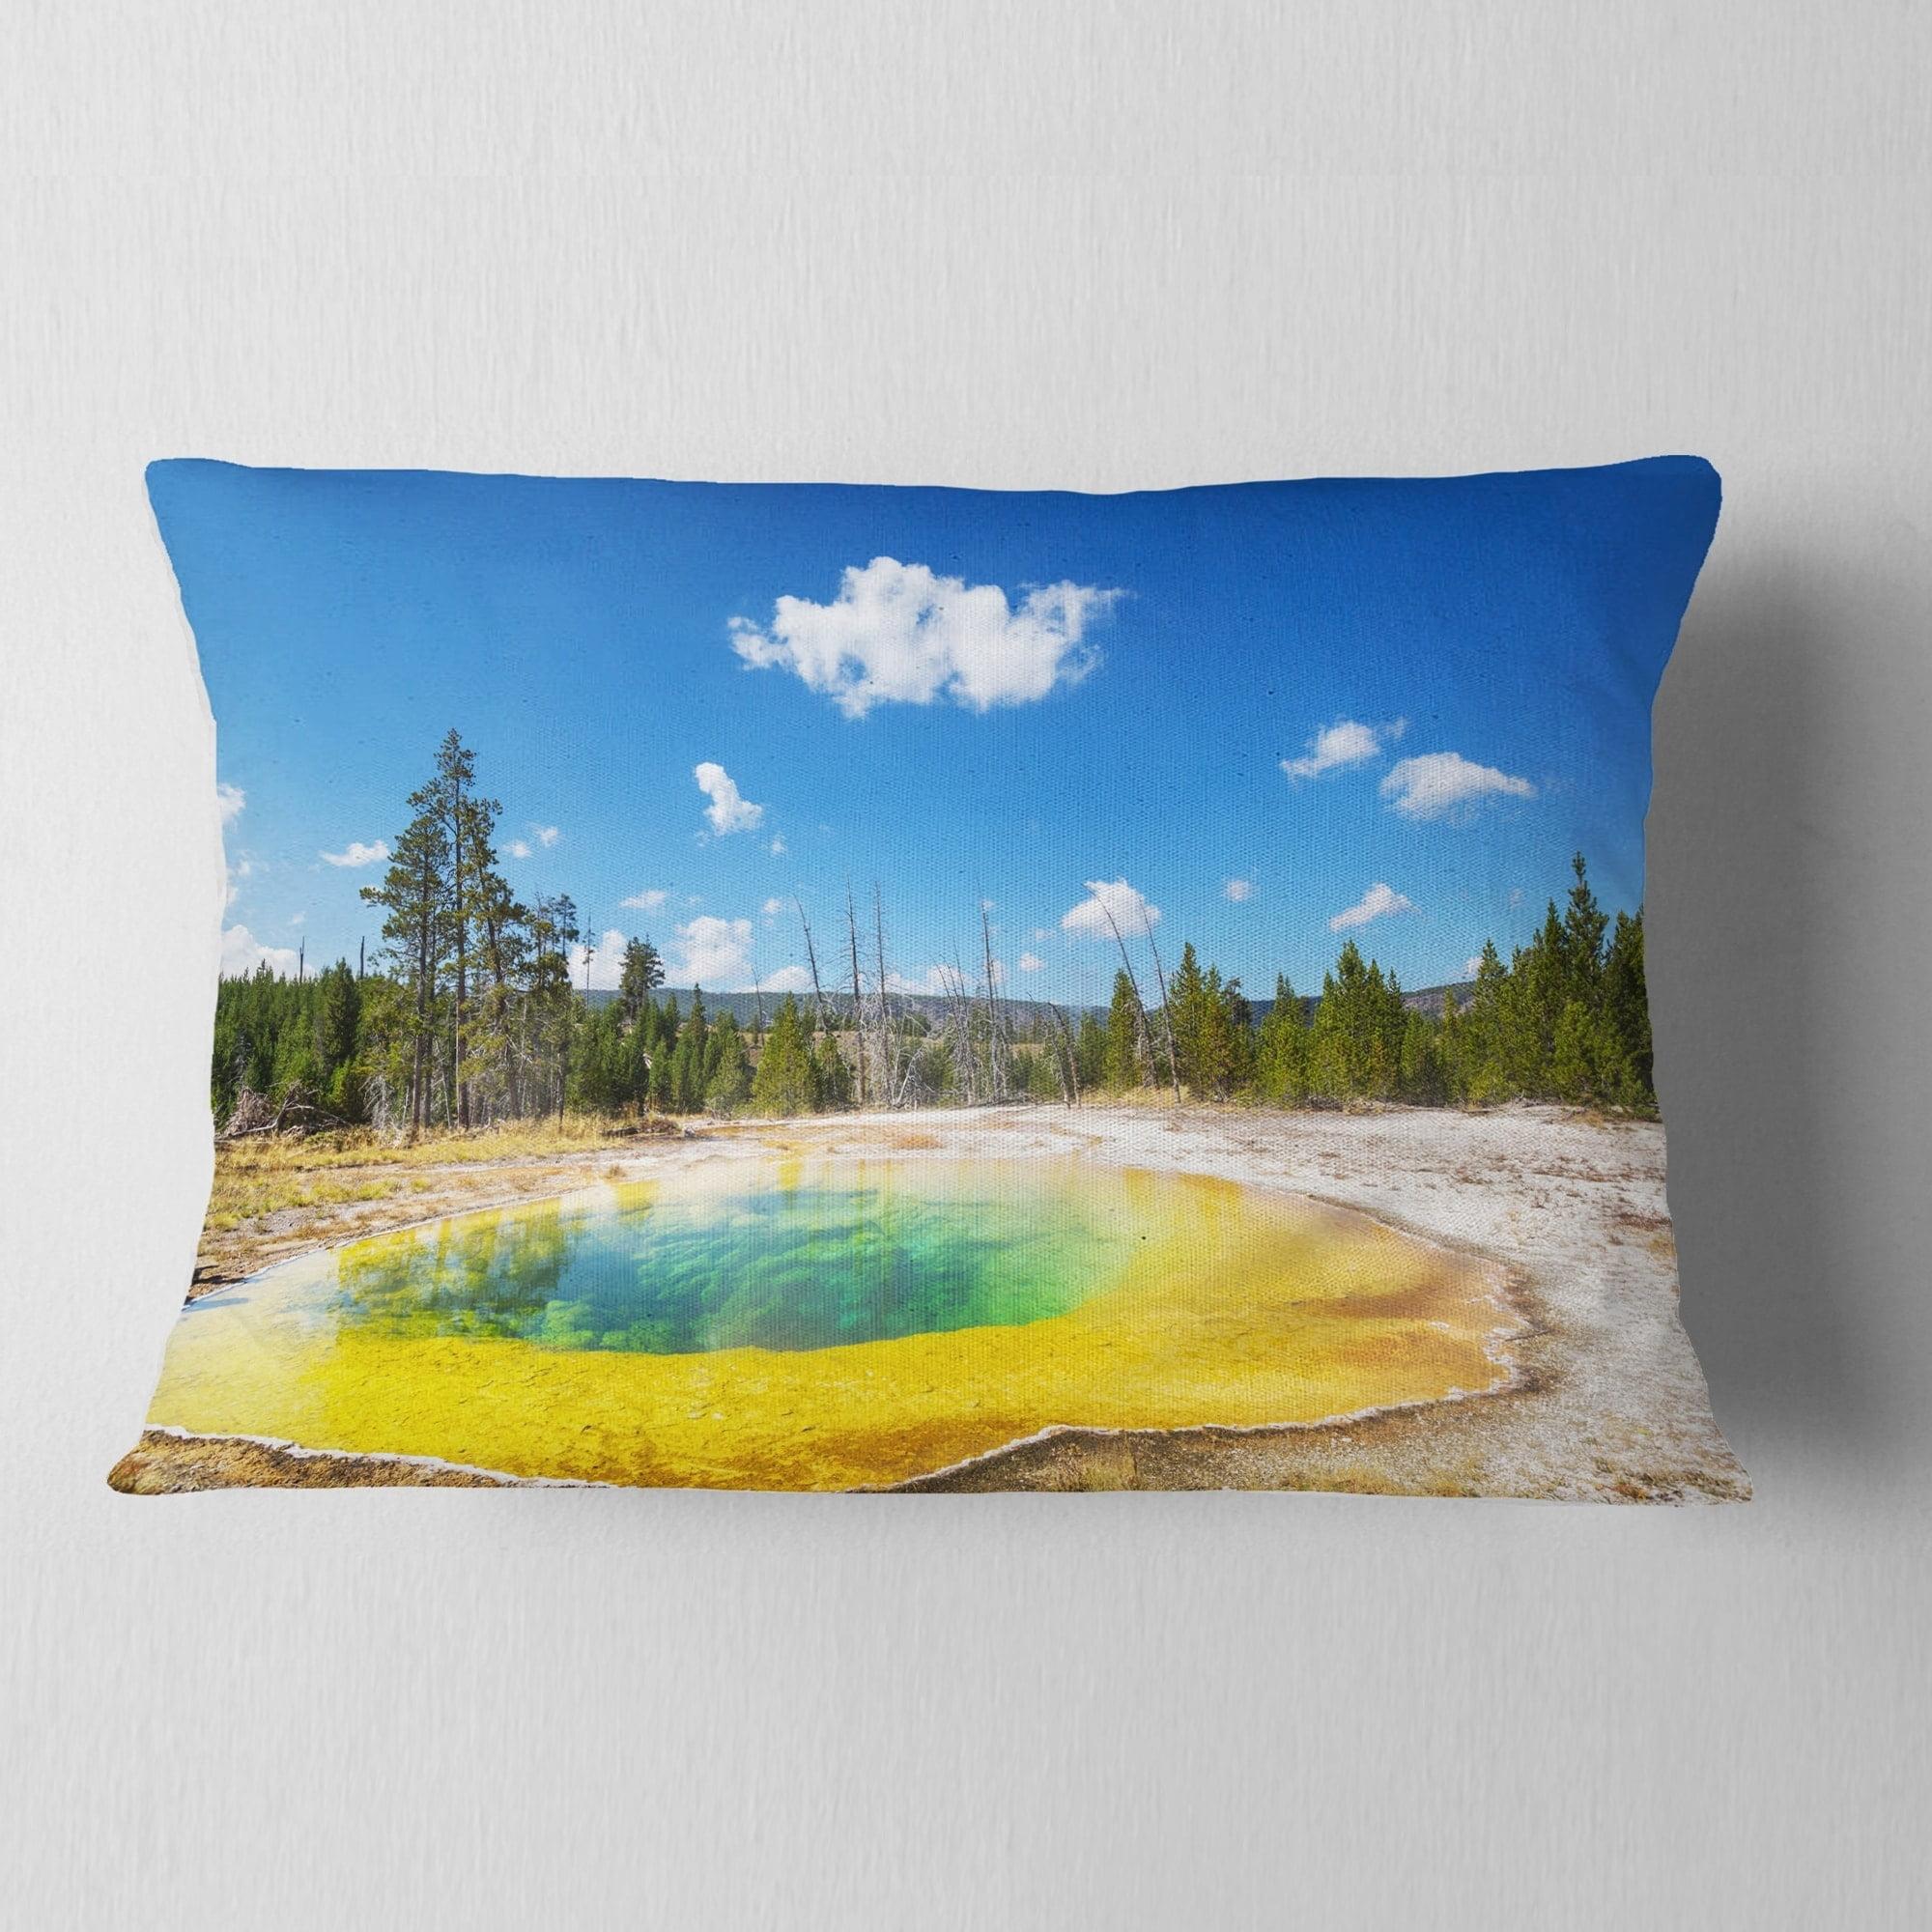 Design Art Designart Morning Glory Pool With Bright Sky Landscape Photography Throw Pillow Walmart Com Walmart Com